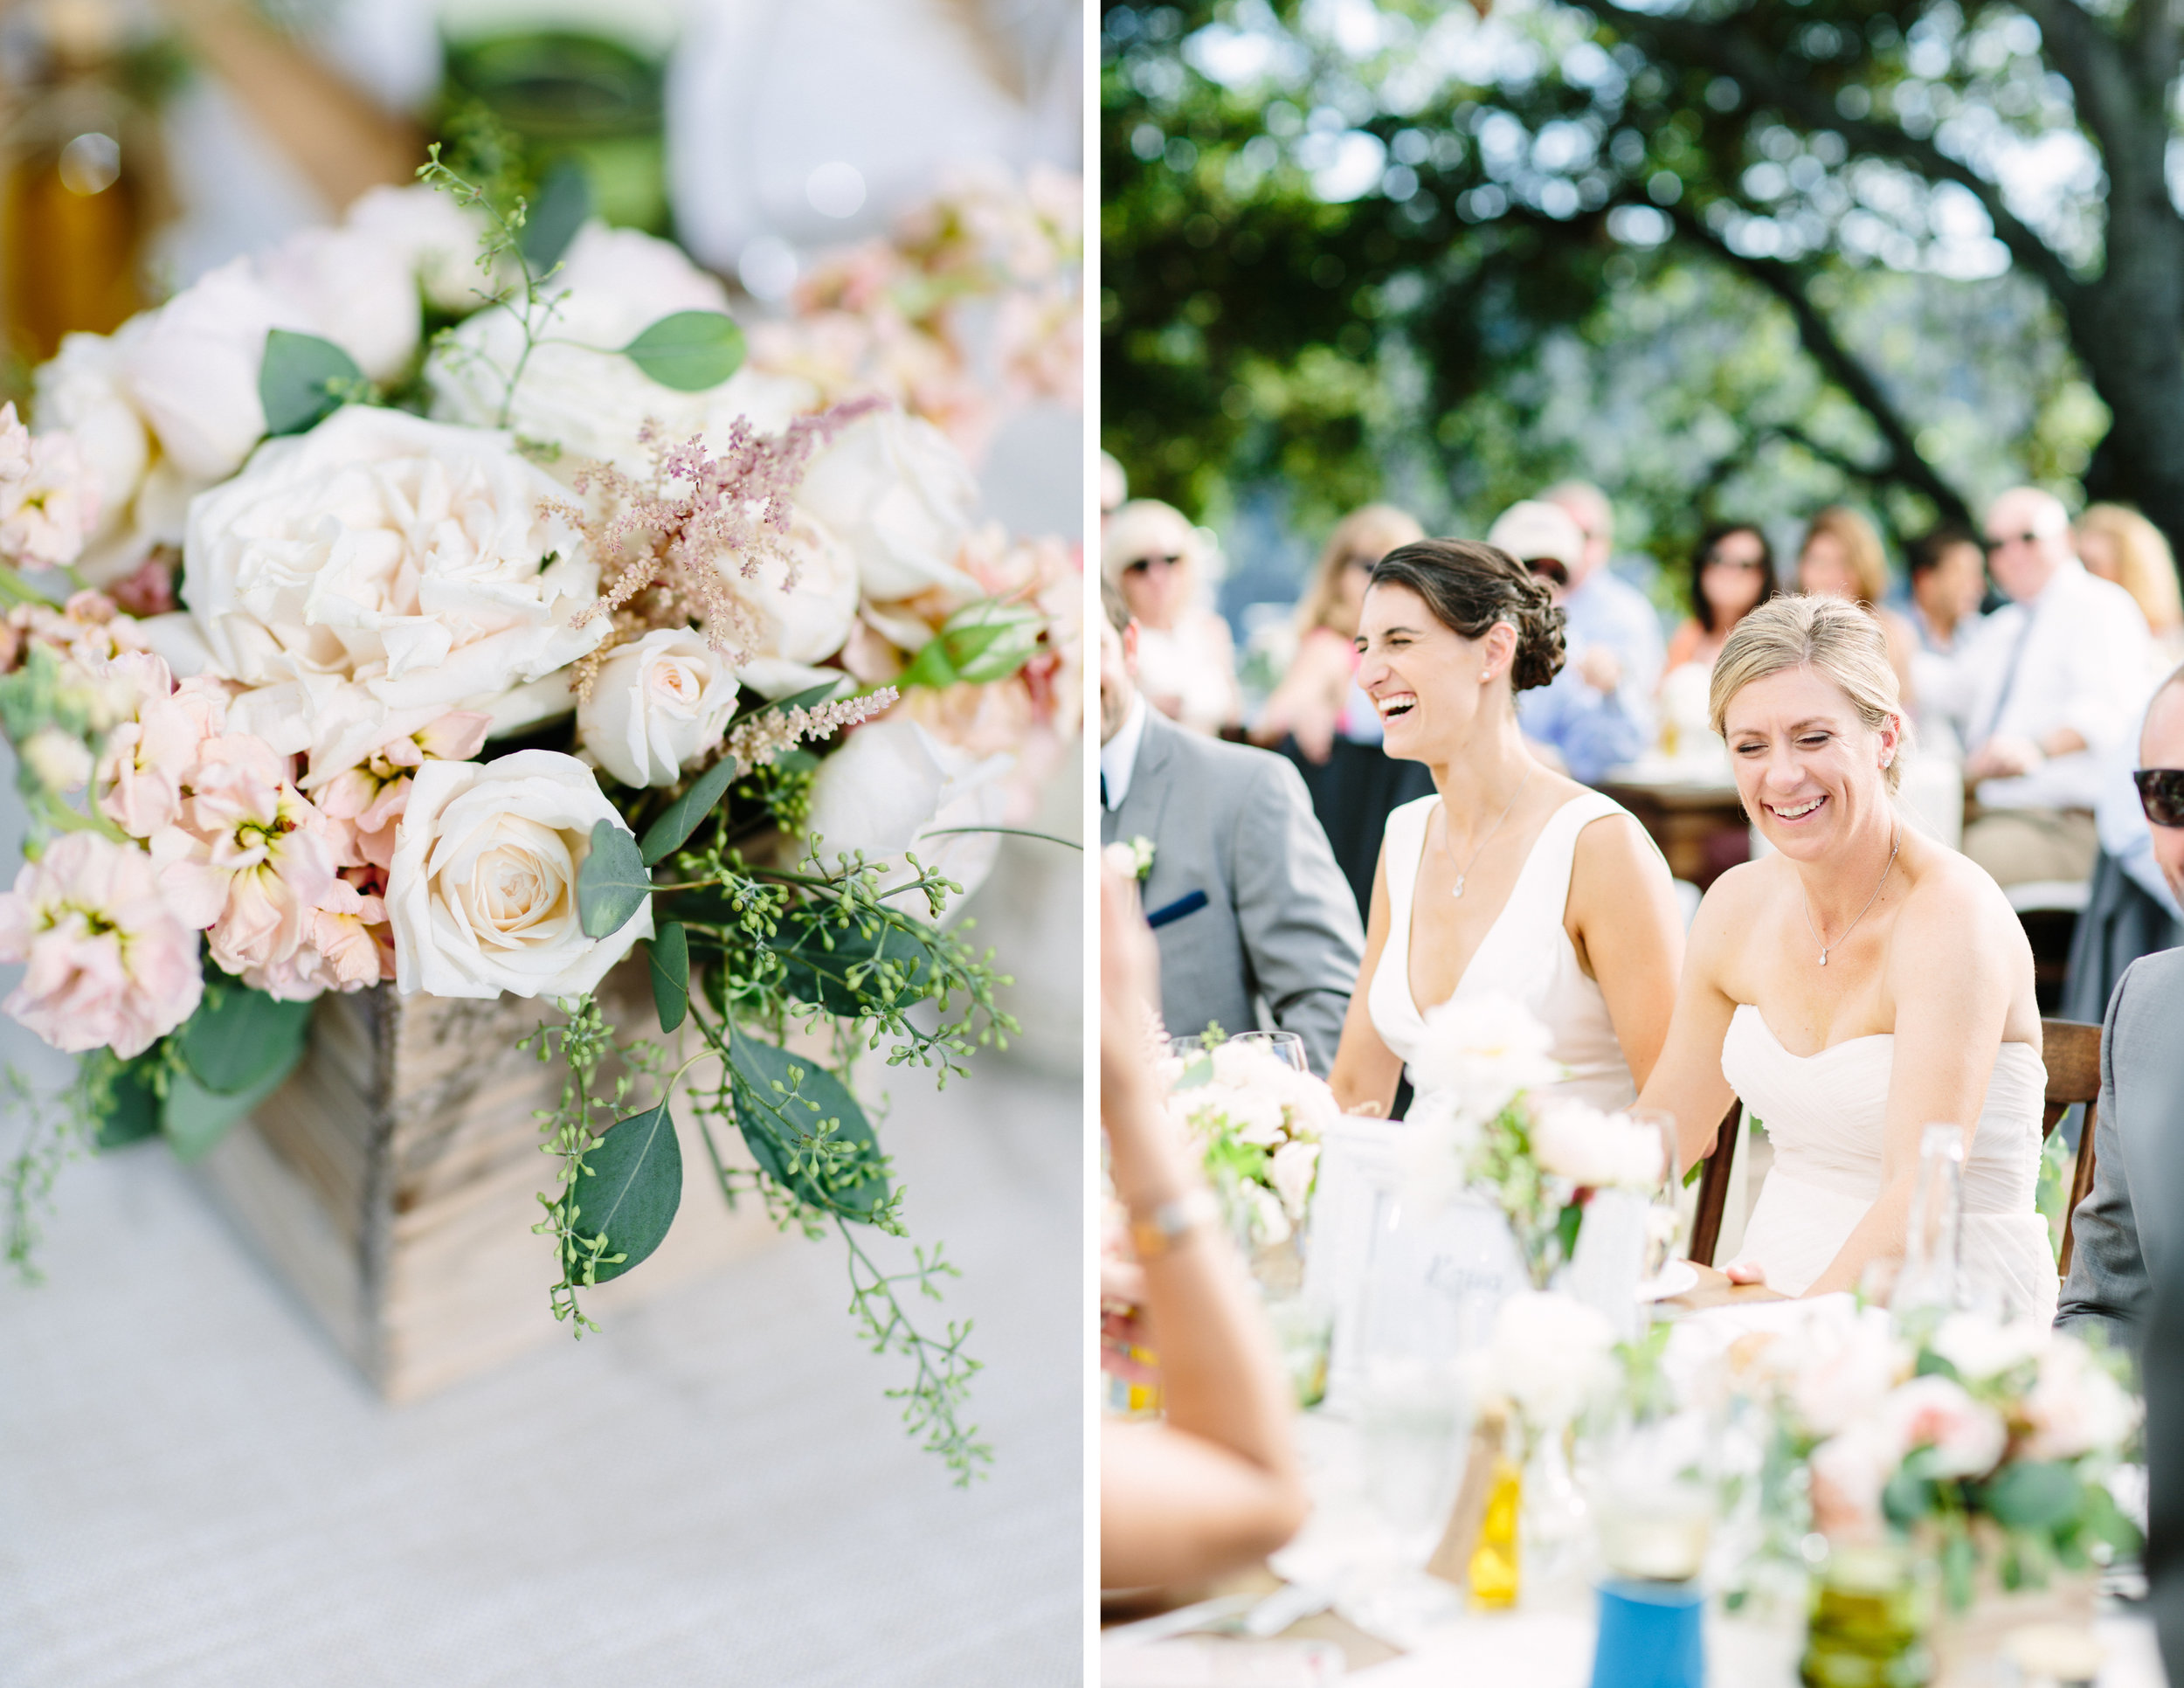 kunde estate winery wedding 13.jpg